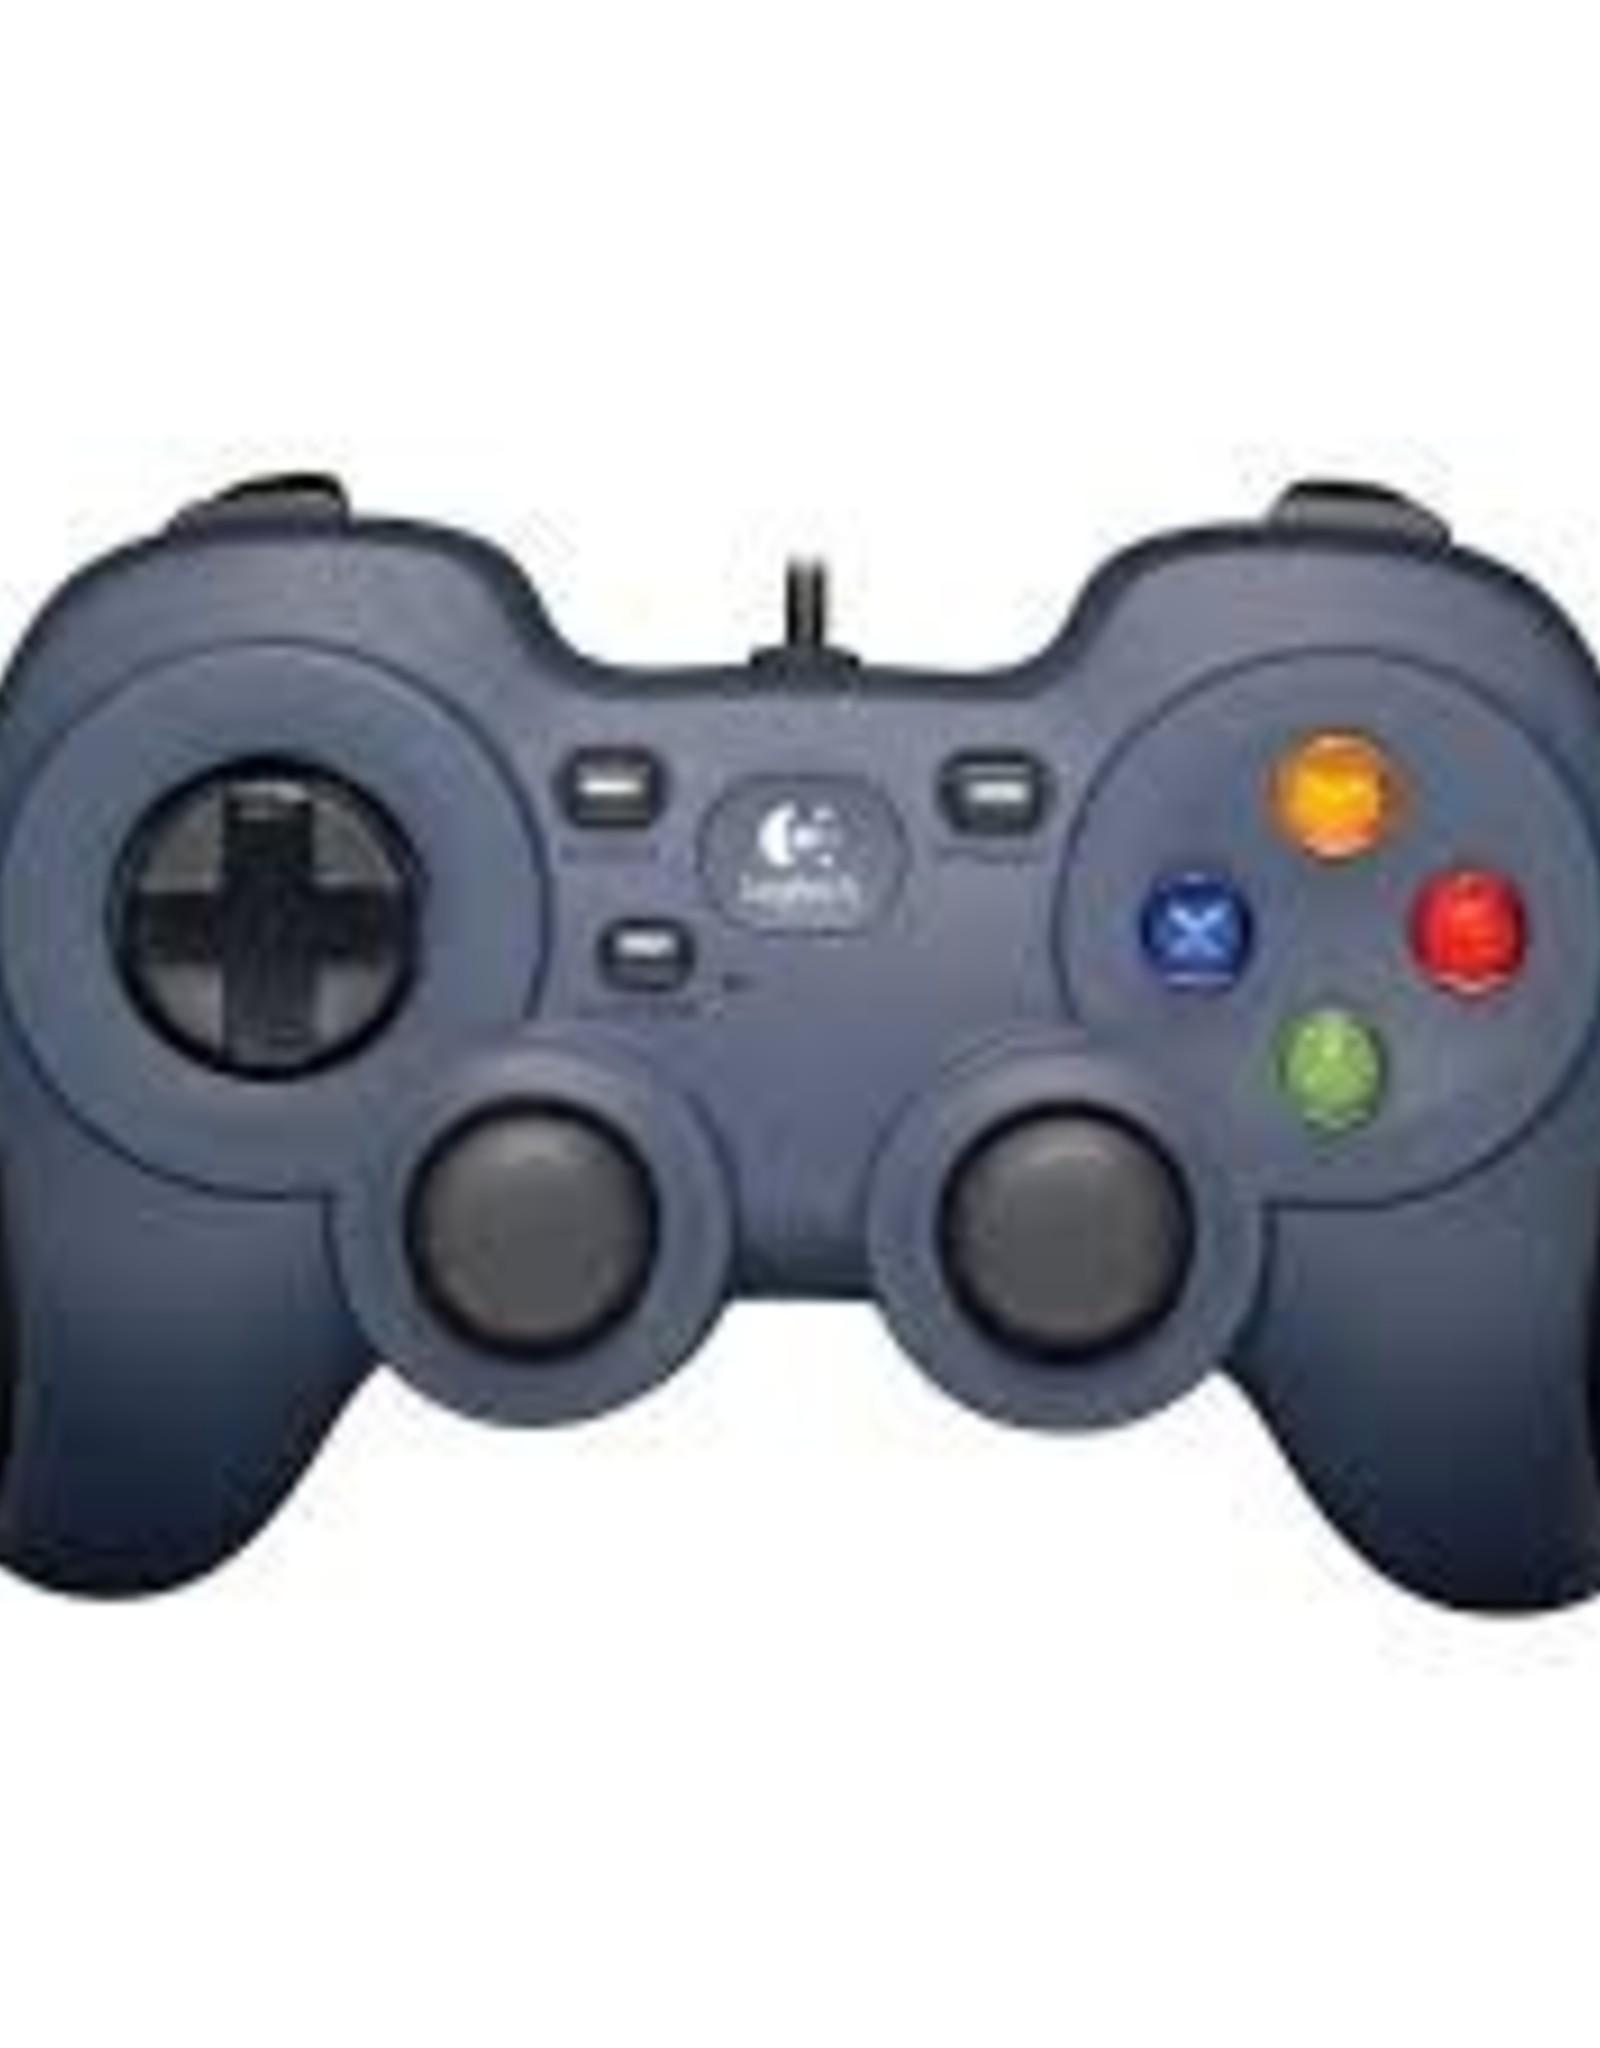 Controller - Logitech F310 PC